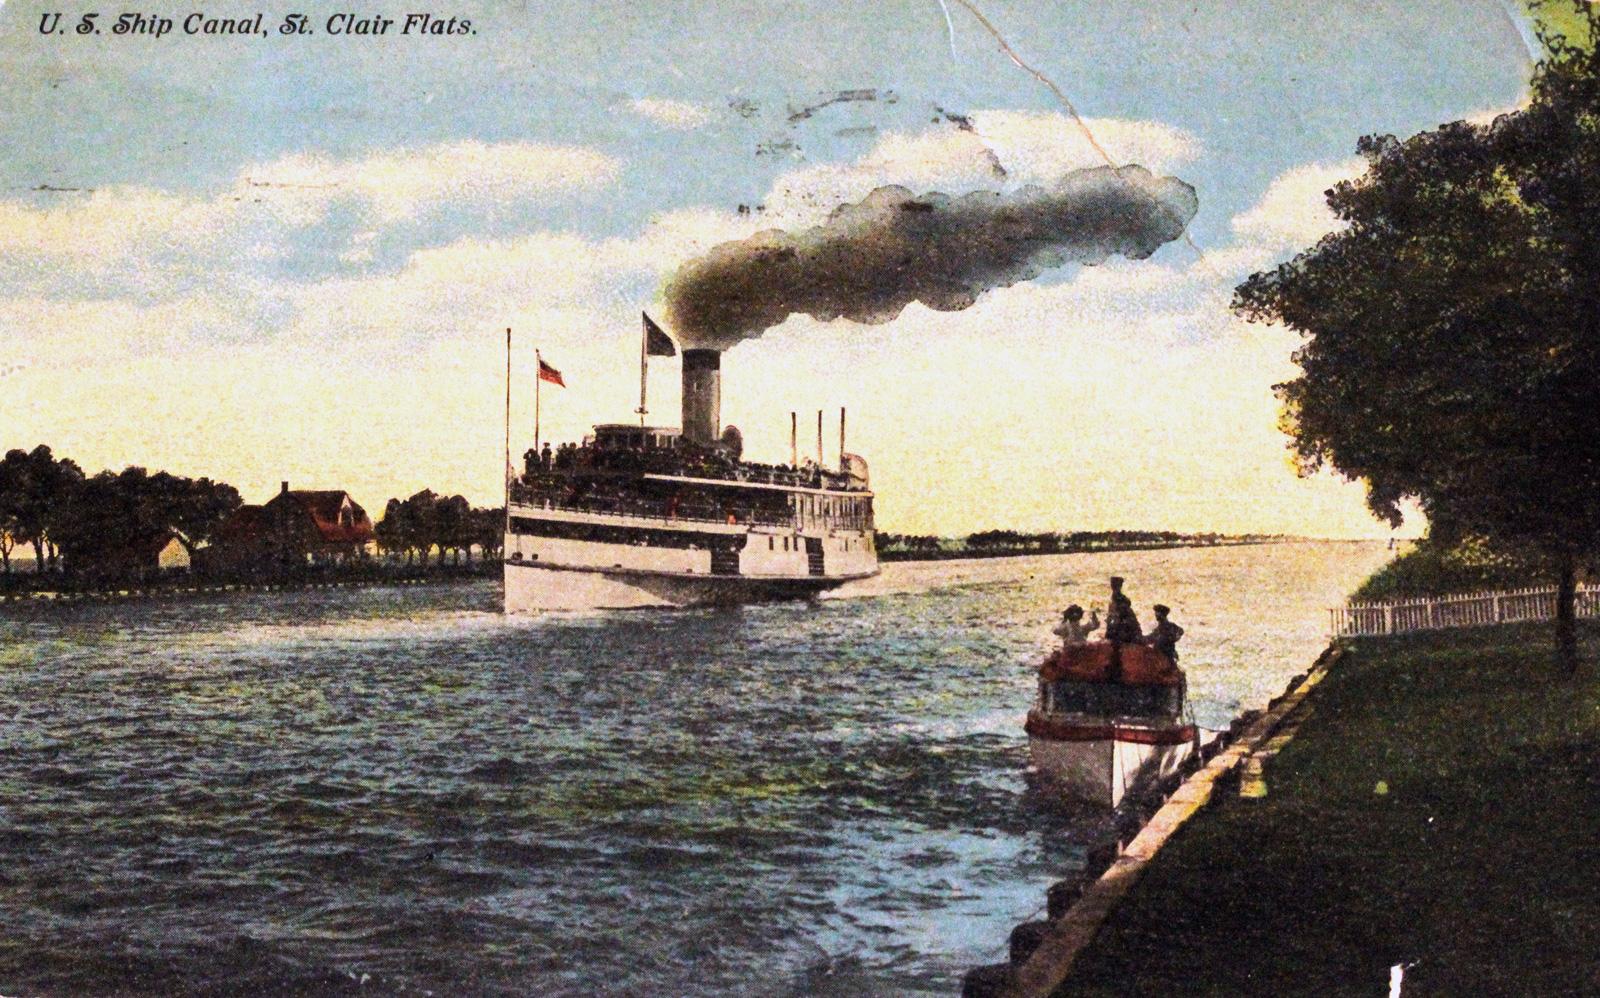 U. S. Ship Canal, St. Clair Flats